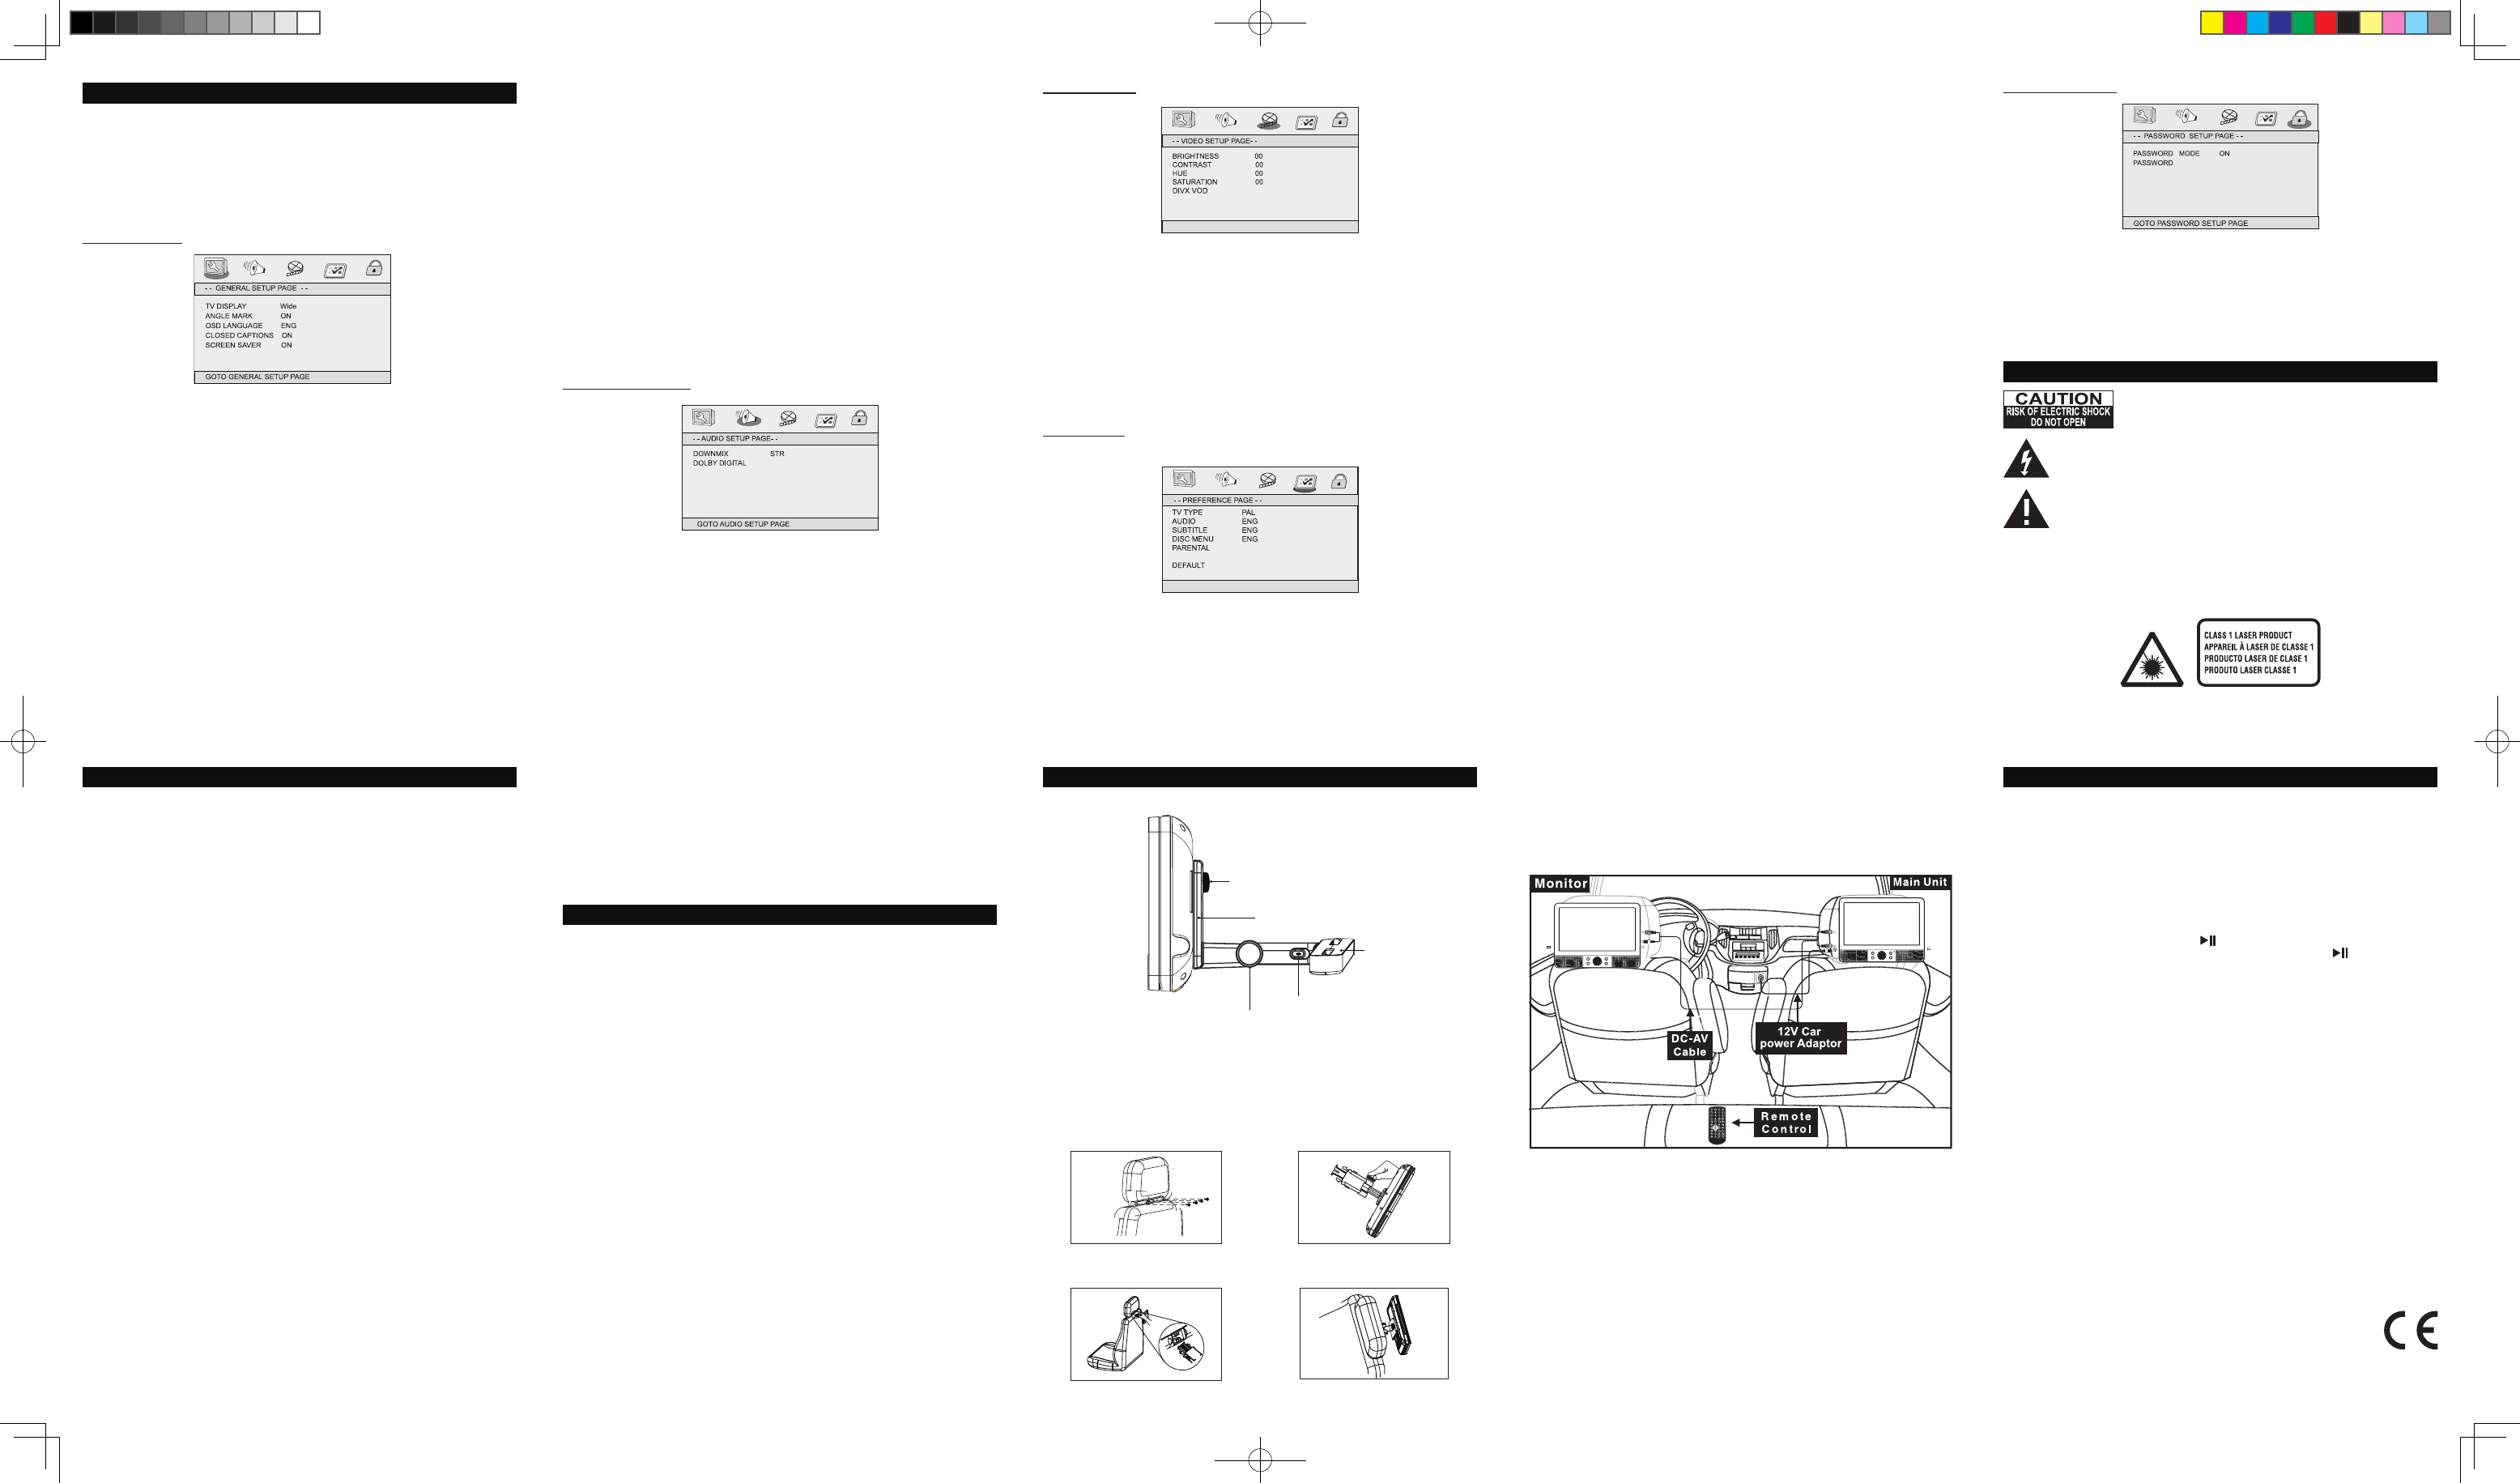 Handleiding Muse M 990 Cvb Pagina 7 Van 14 Deutsch